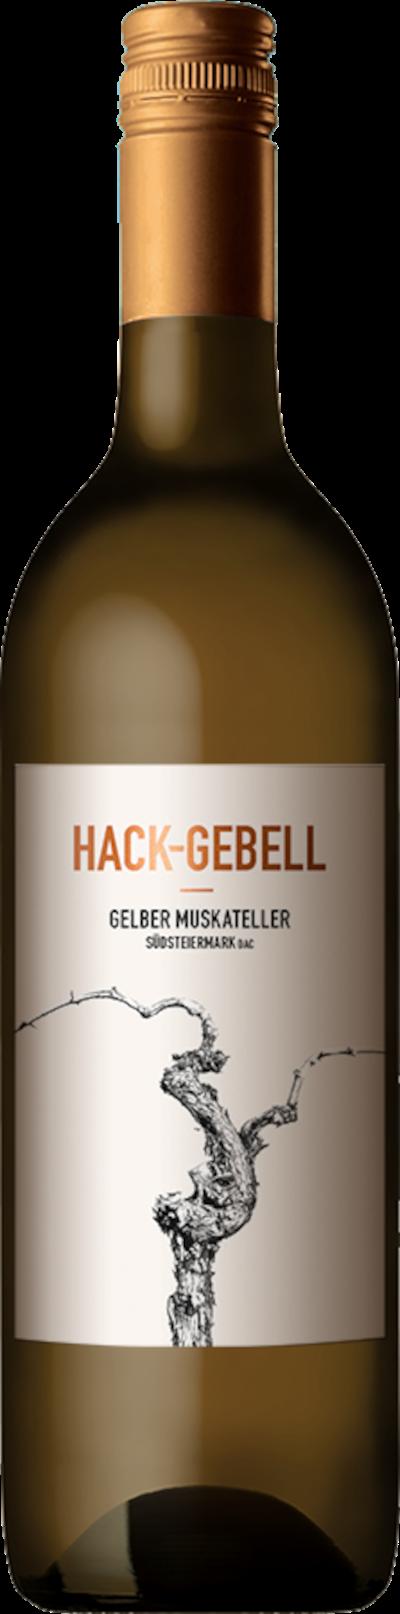 Hack-Gebell - Gelber Muskateller Südsteiermark DAC